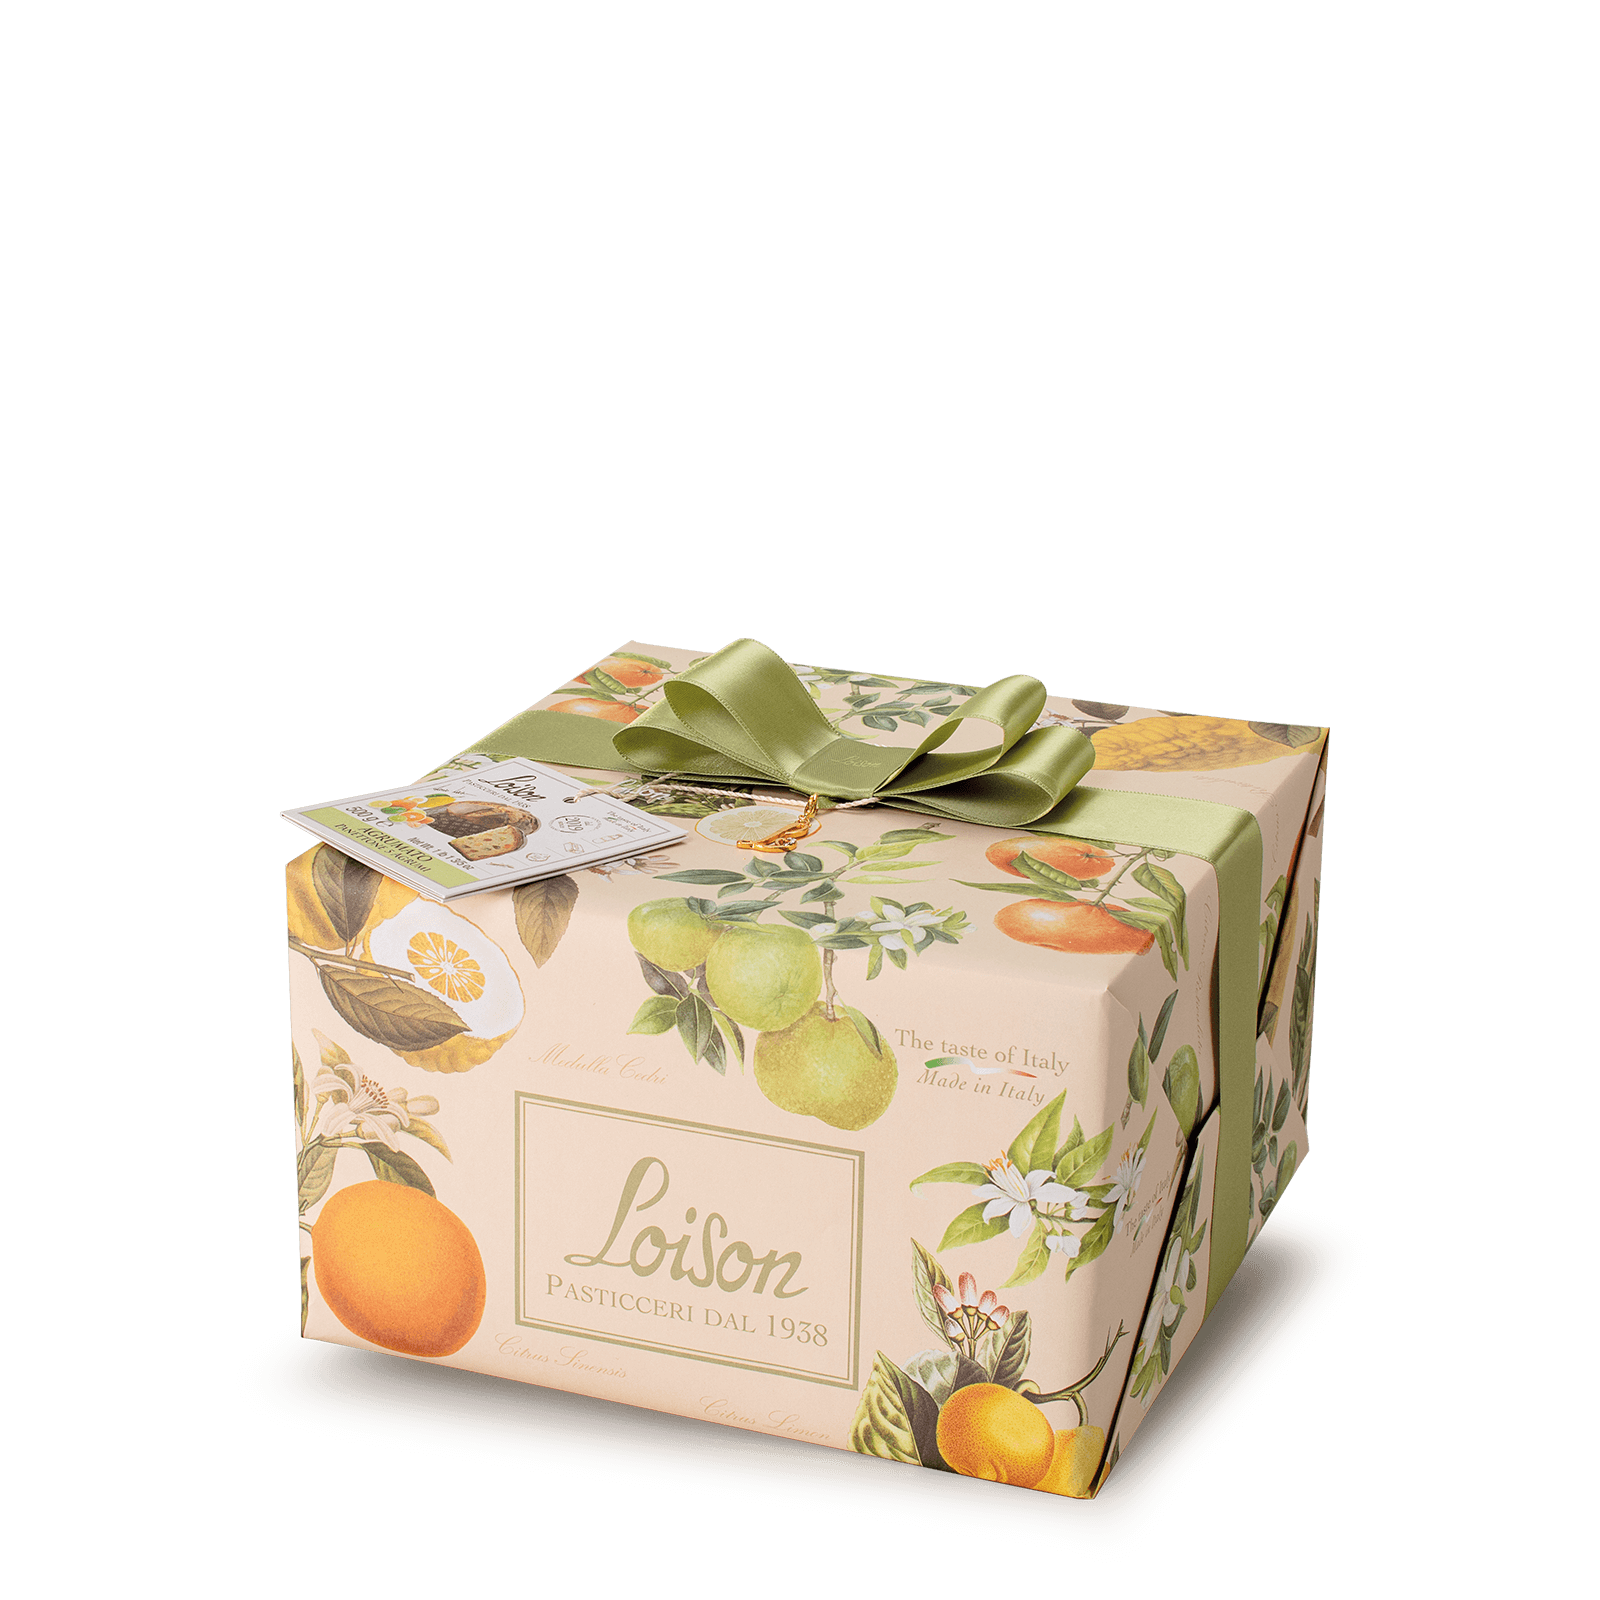 5 citrus fruits Panettone - Fruit and Flowers Loison